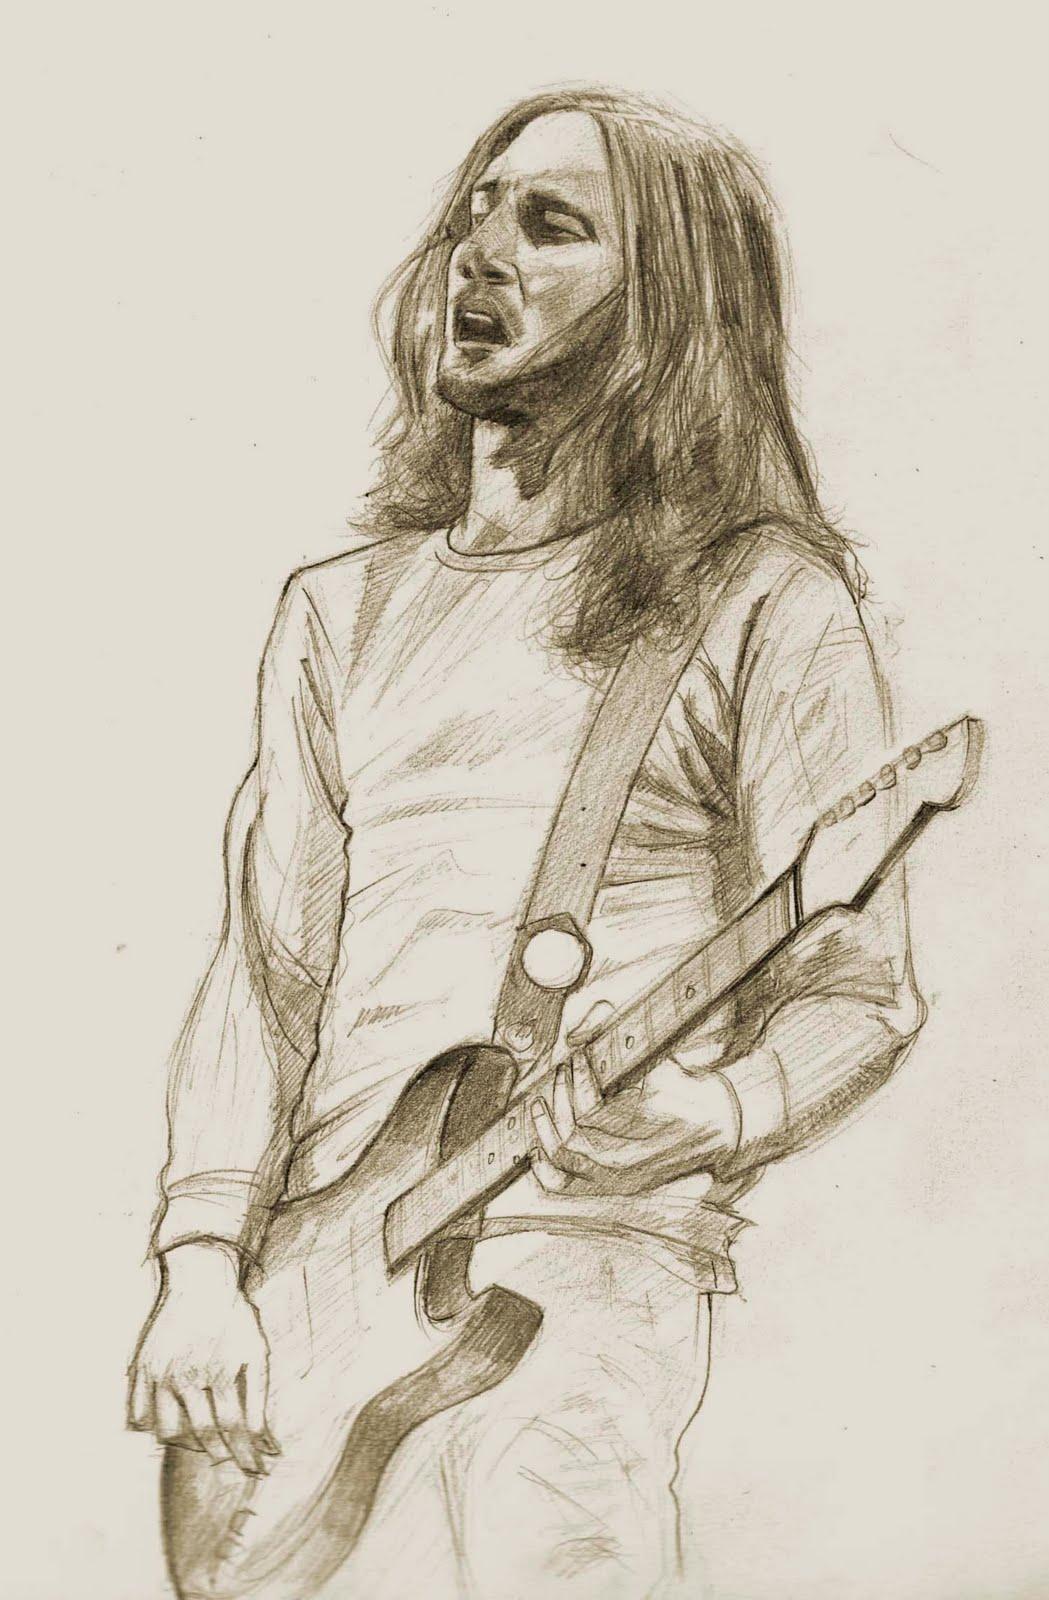 http://4.bp.blogspot.com/-bk7w2JOcNSI/TroKOmoFXSI/AAAAAAAAA6Y/_eGimtJB9wI/s1600/John%2BFruciante.jpg